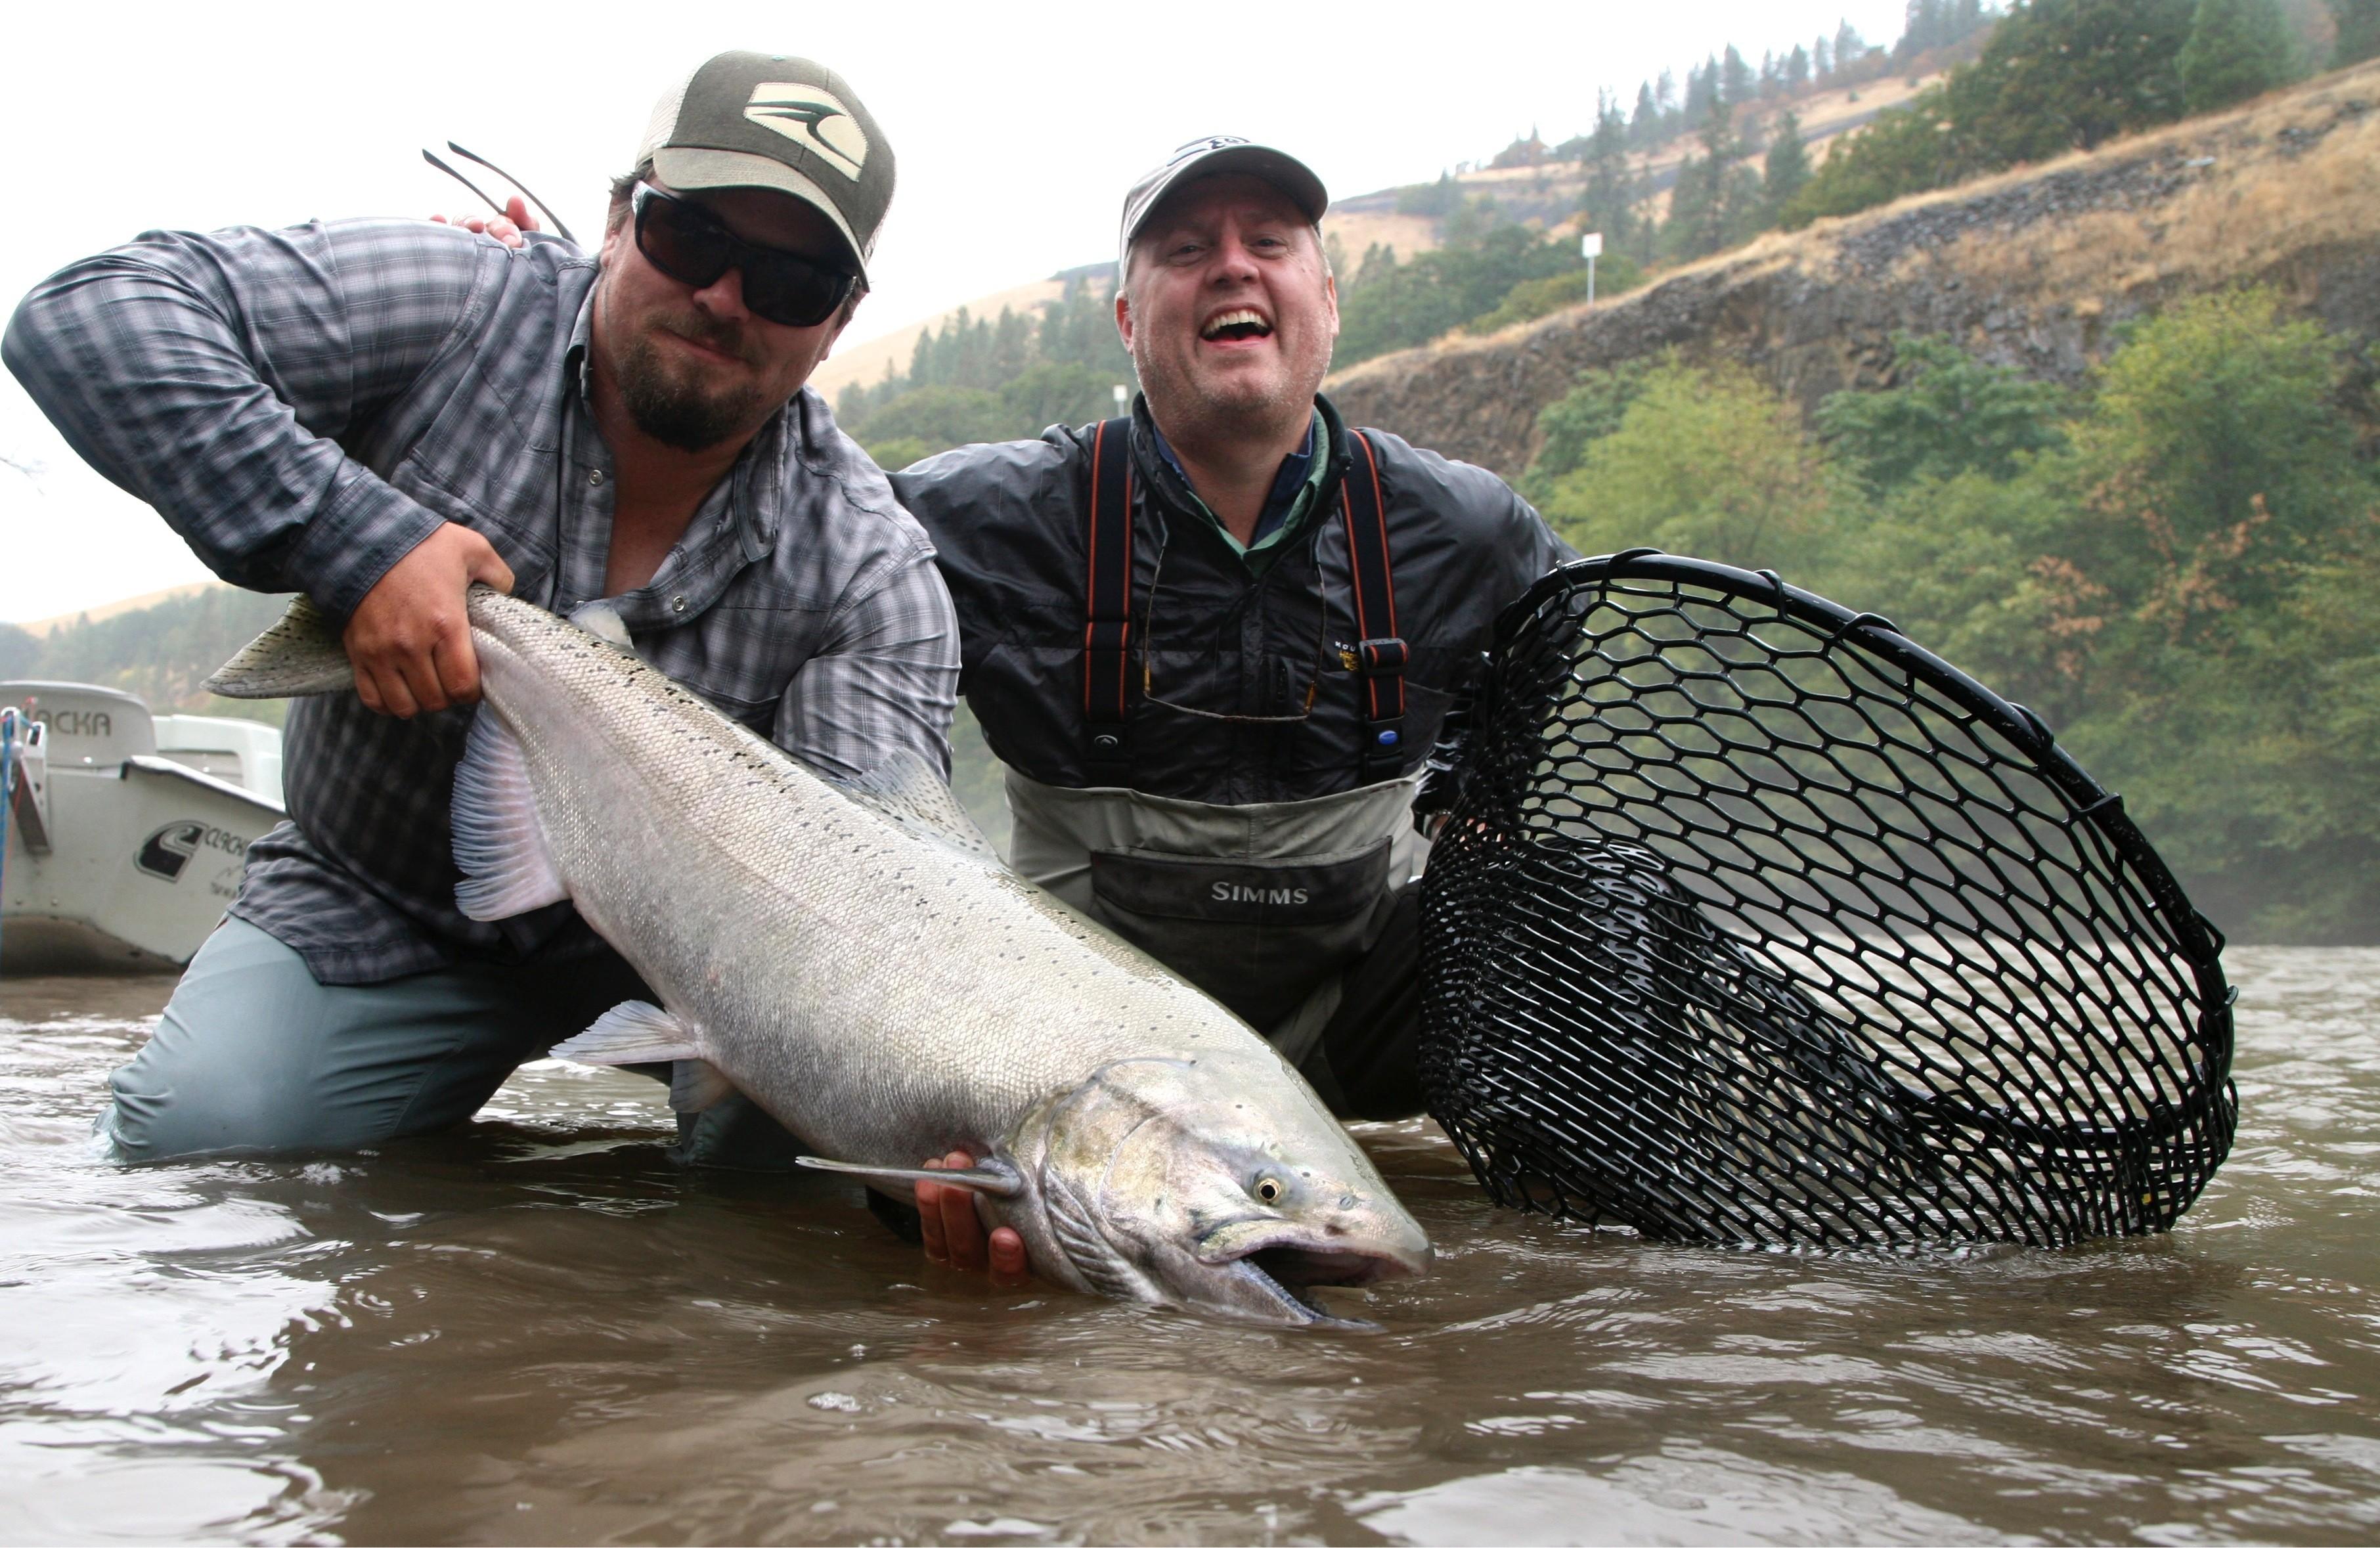 Agee Outfitting: Pacific Steelhead/Salmon